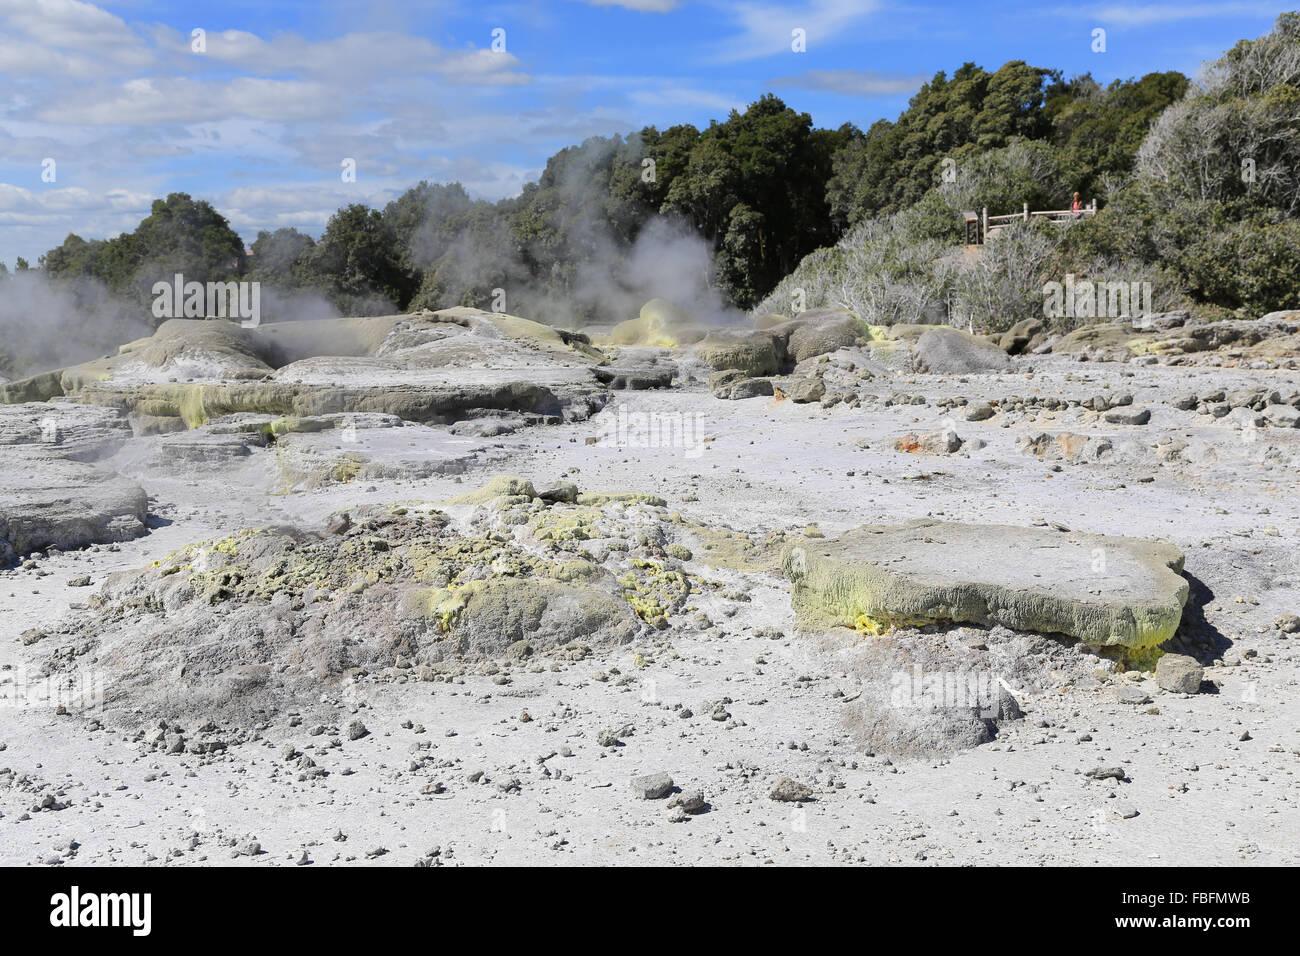 Steaming sulfurous fumaroles at Rotorua, Bay of Plenty, New Zealand. - Stock Image